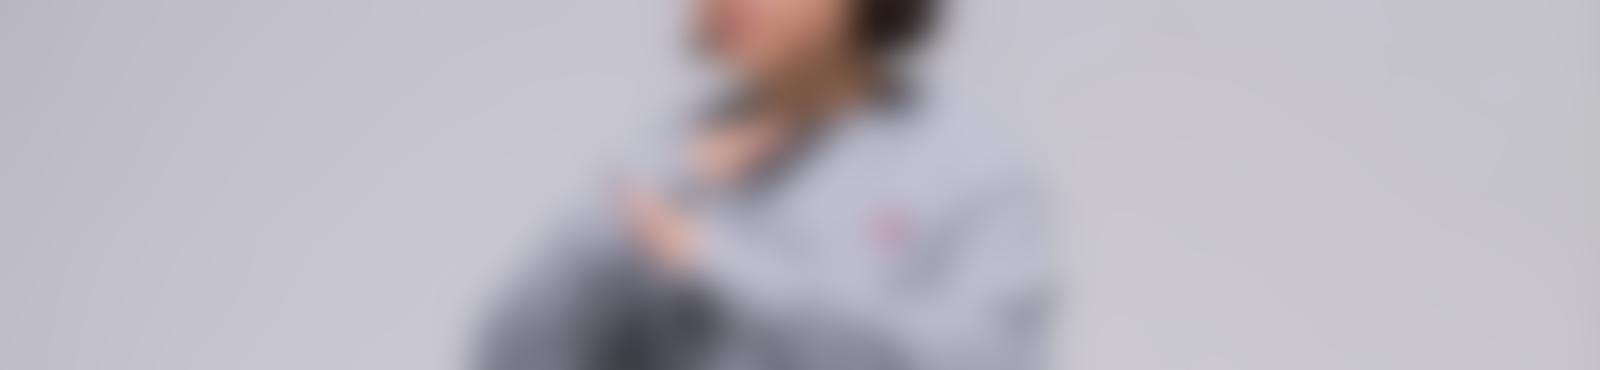 Blurred c5d0e9da 3d78 4140 b30a c783264de1d1